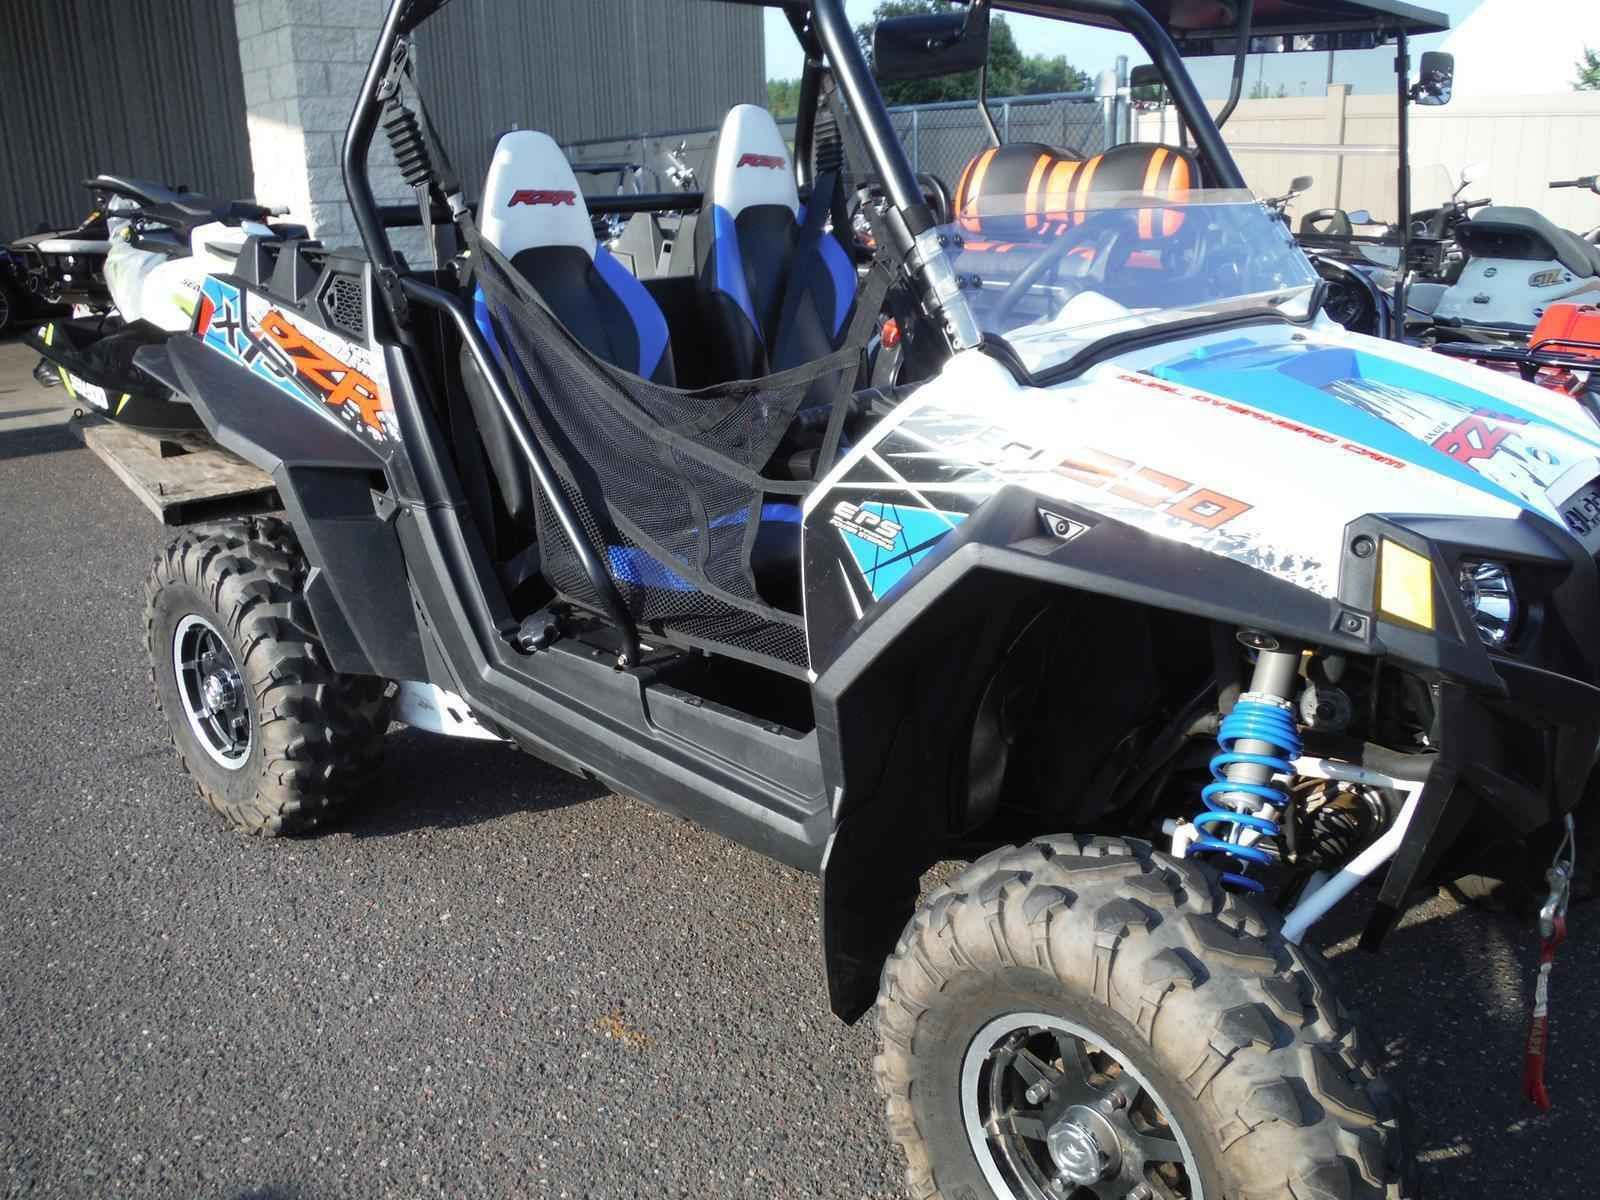 Used 2012 Polaris RANGER RZR XP 900 ATVs For Sale in Minnesota. 2012 POLARIS  RANGER